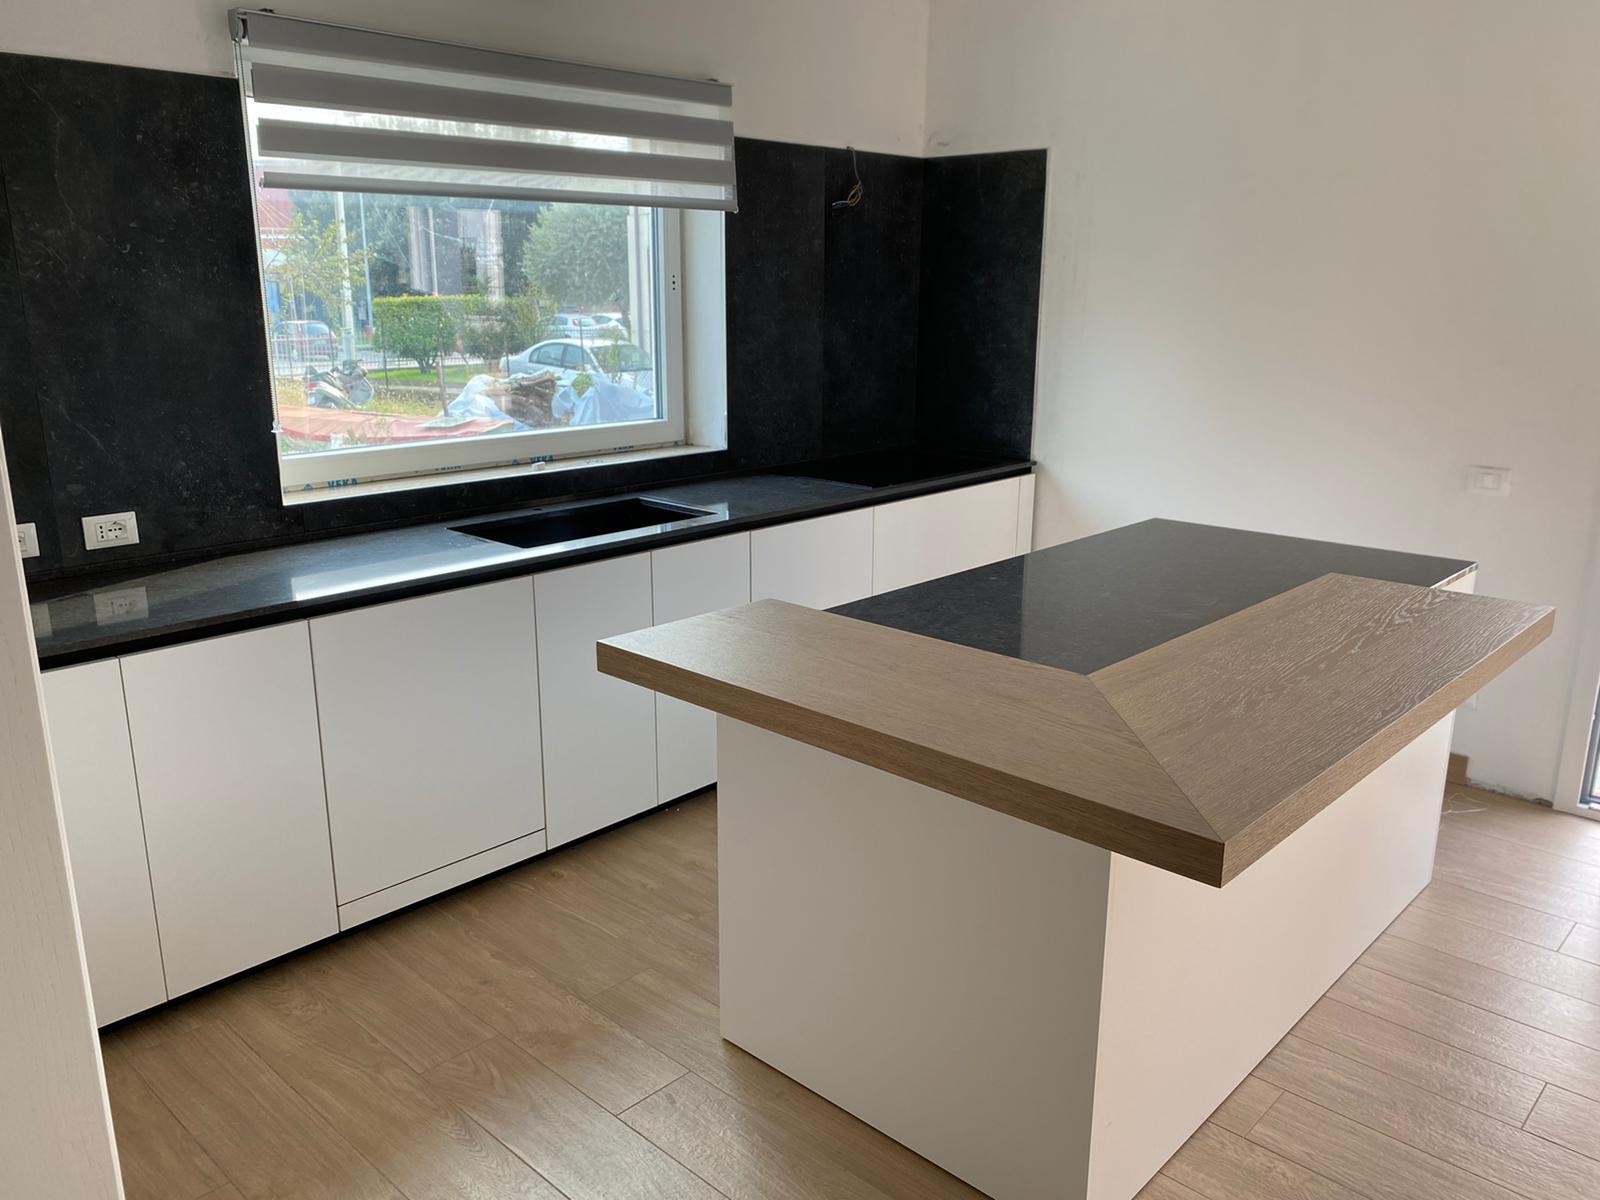 ICM - Cucina Bianca Moderna con Isola